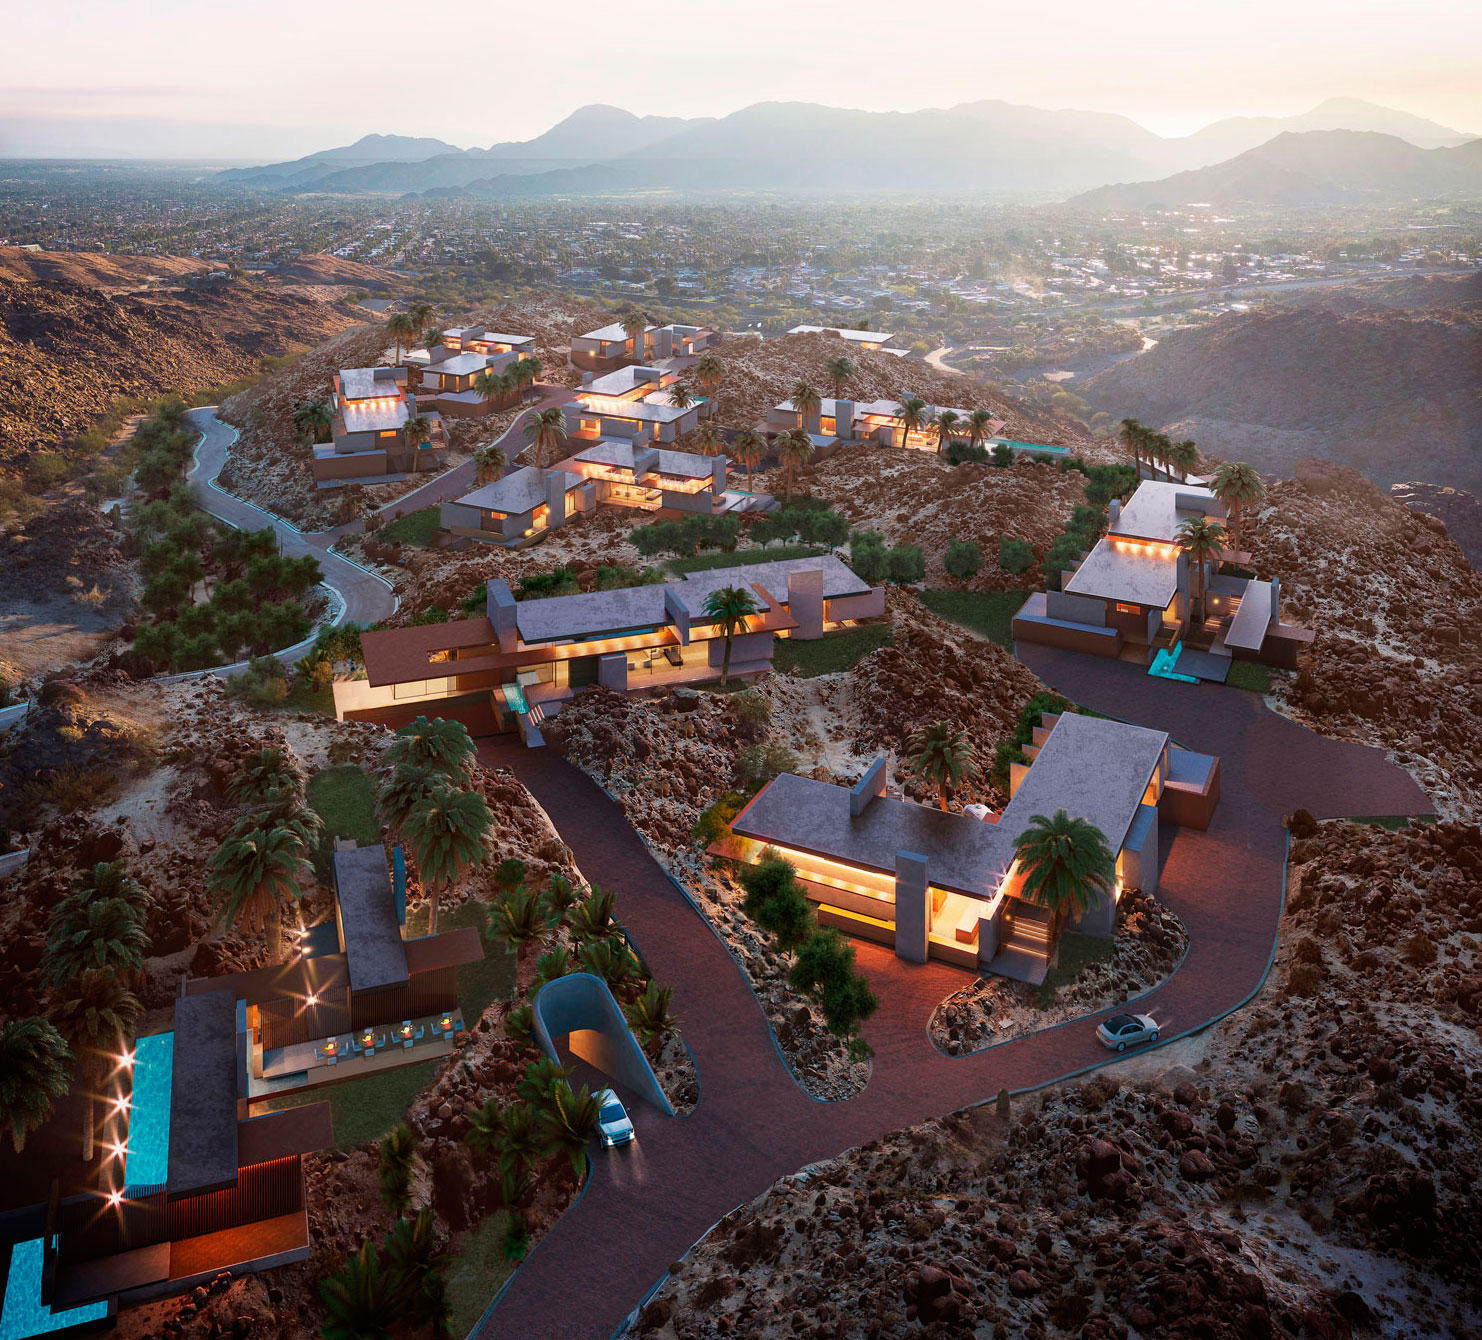 Photo of Lot 9 Nighthawk Estates, Palm Desert, CA 92260